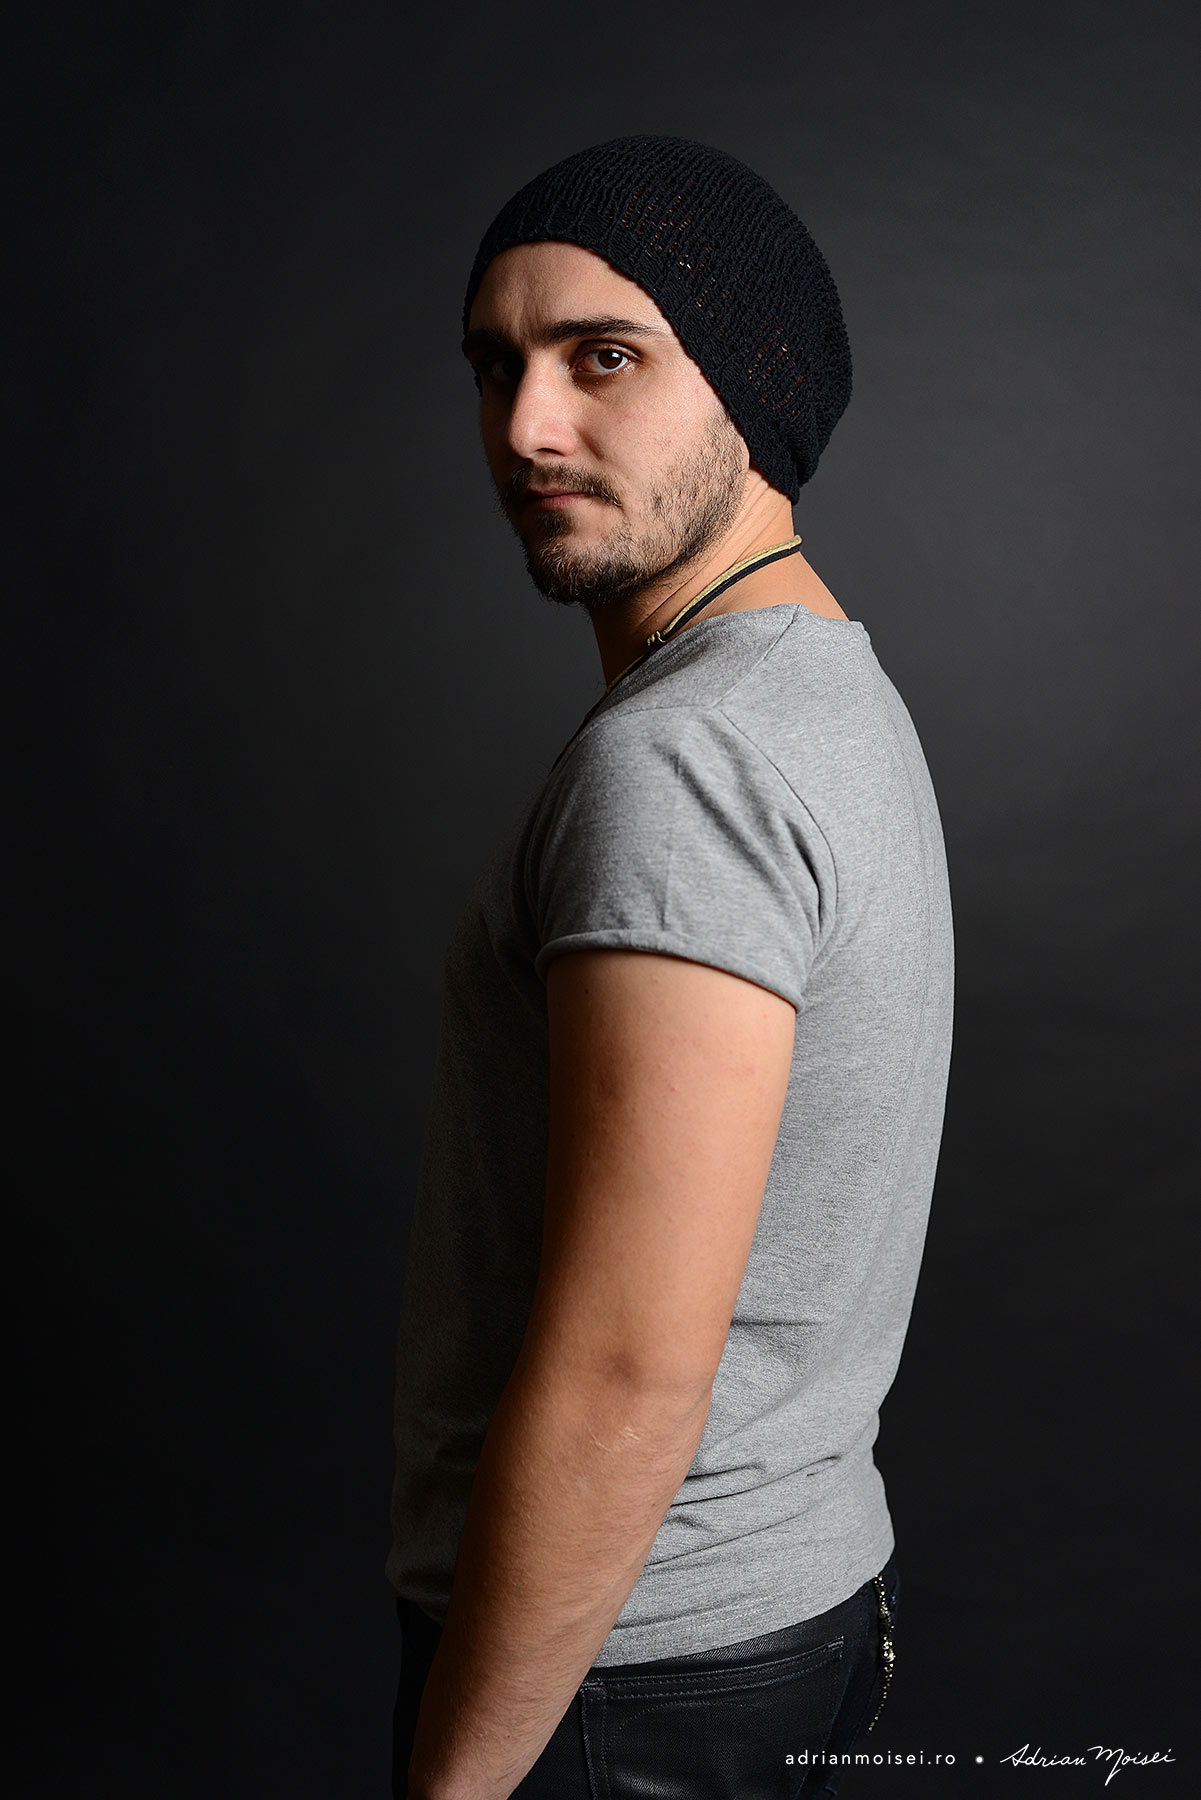 Fotografie de portret cu barbat tanar, cu barba, realizata in studioul de fotografie Iasi, Adrian Moisei